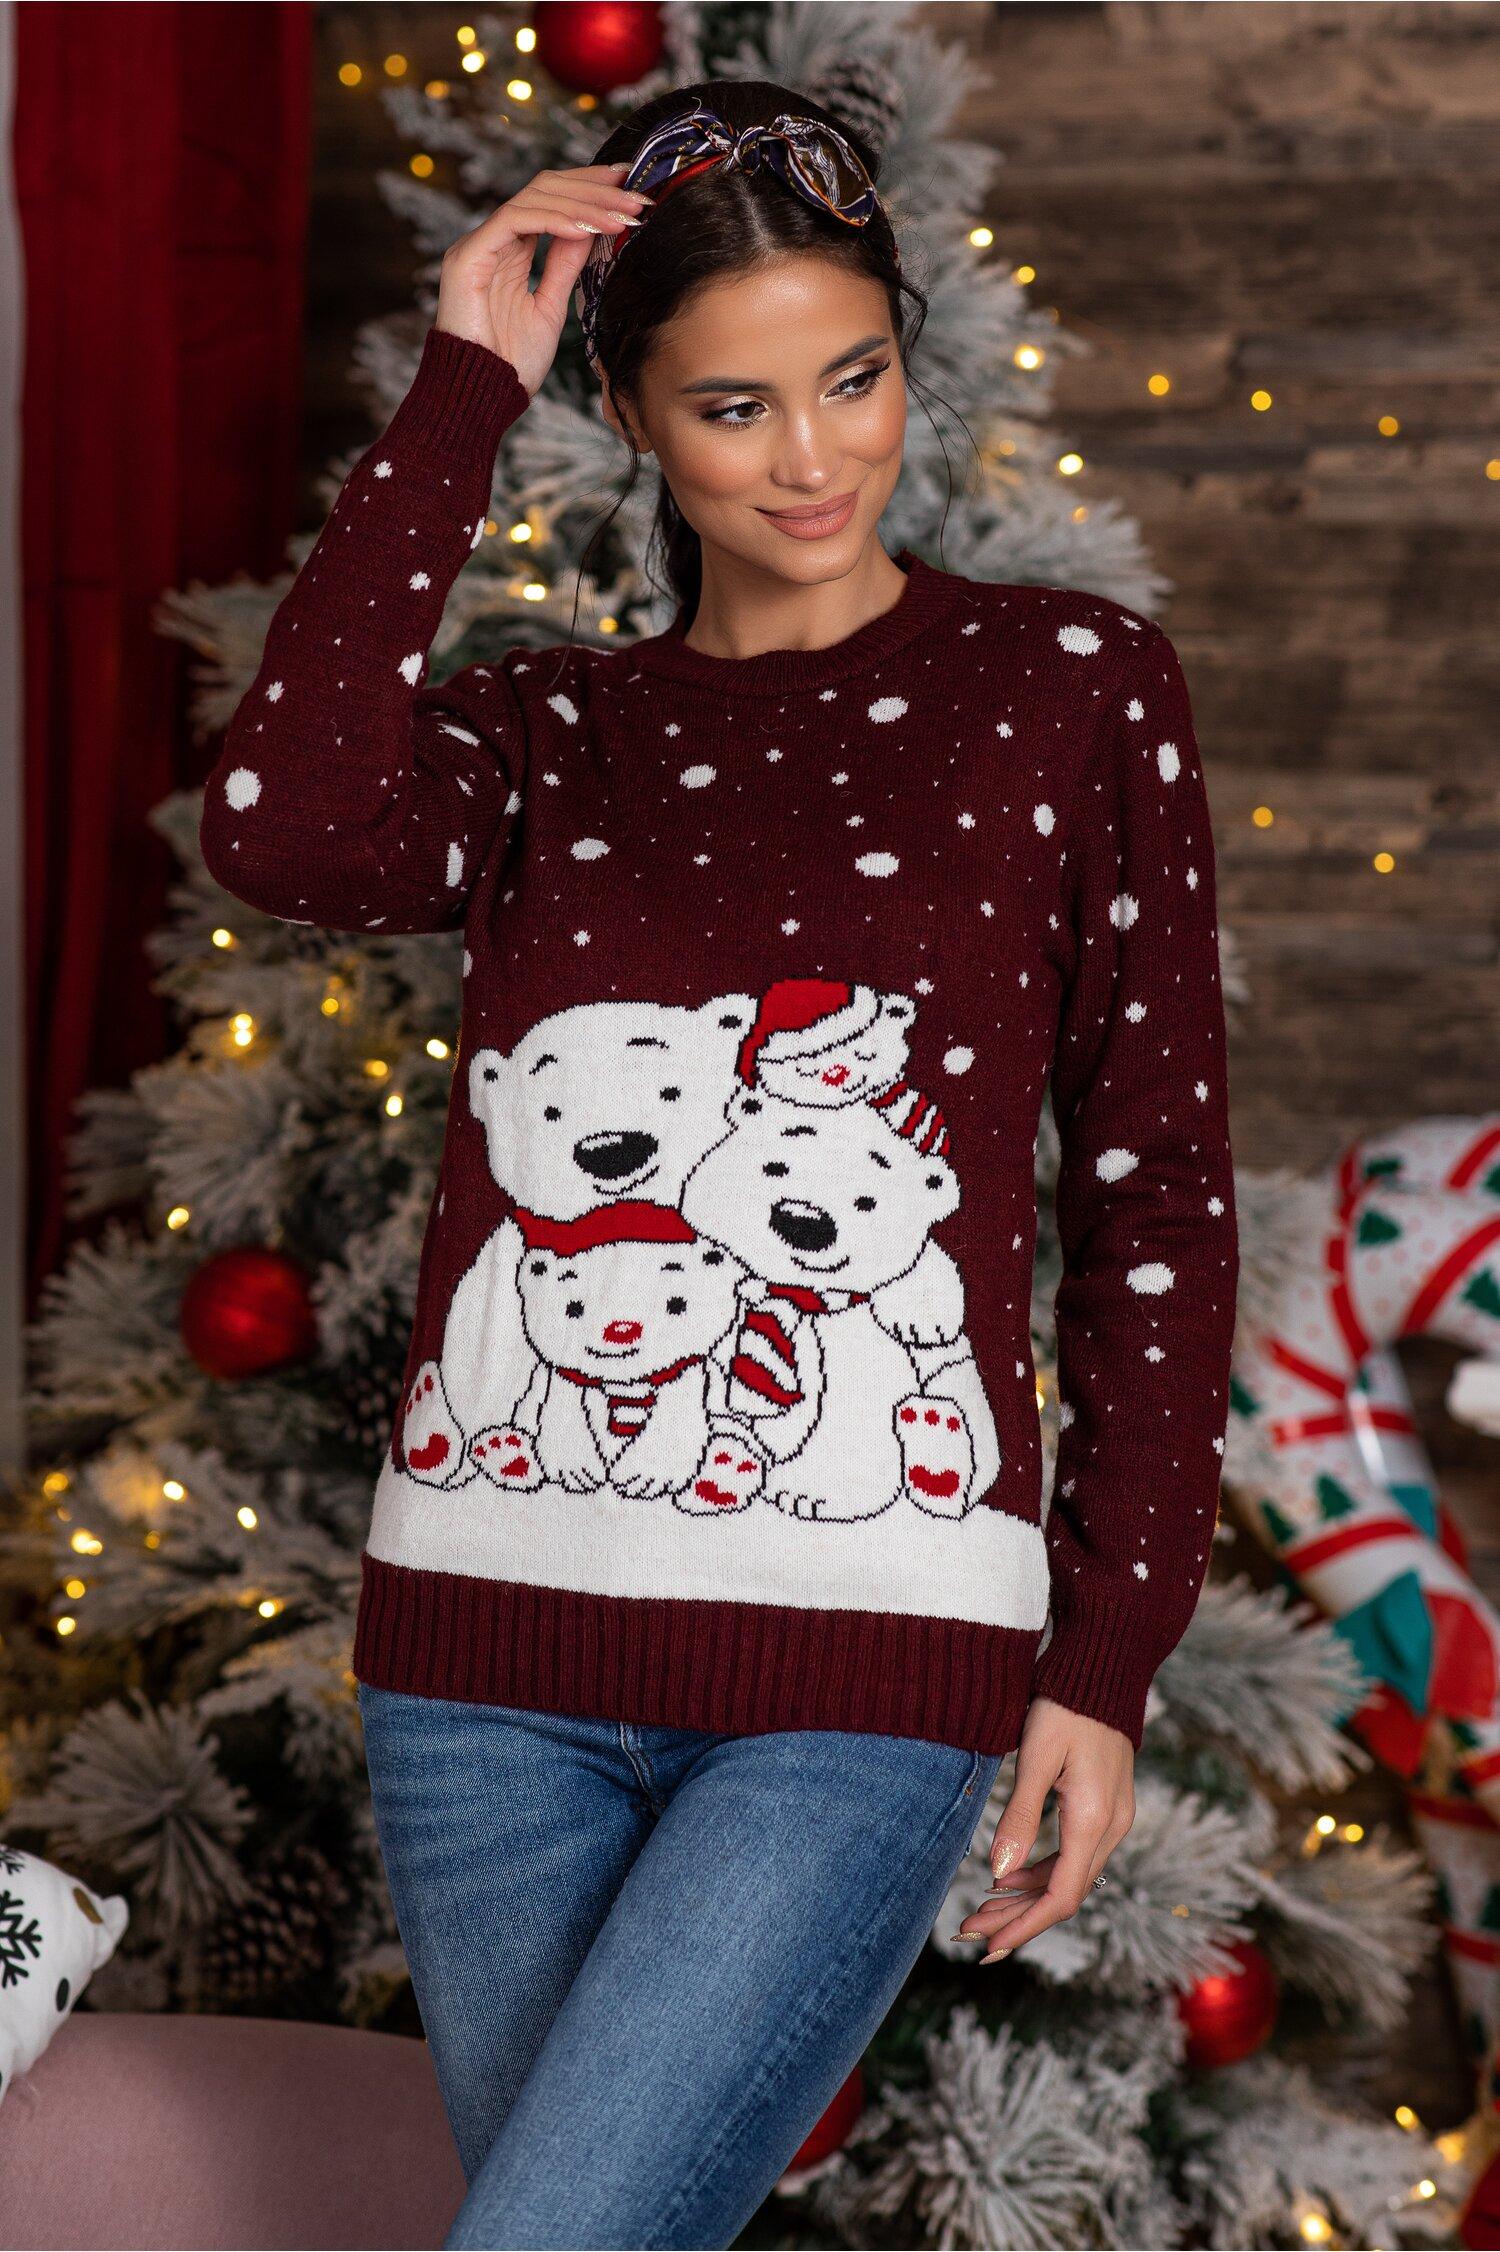 Bluza Polar Bear bordo cu imprimeu de iarna Idei Cadouri de Craciun Online